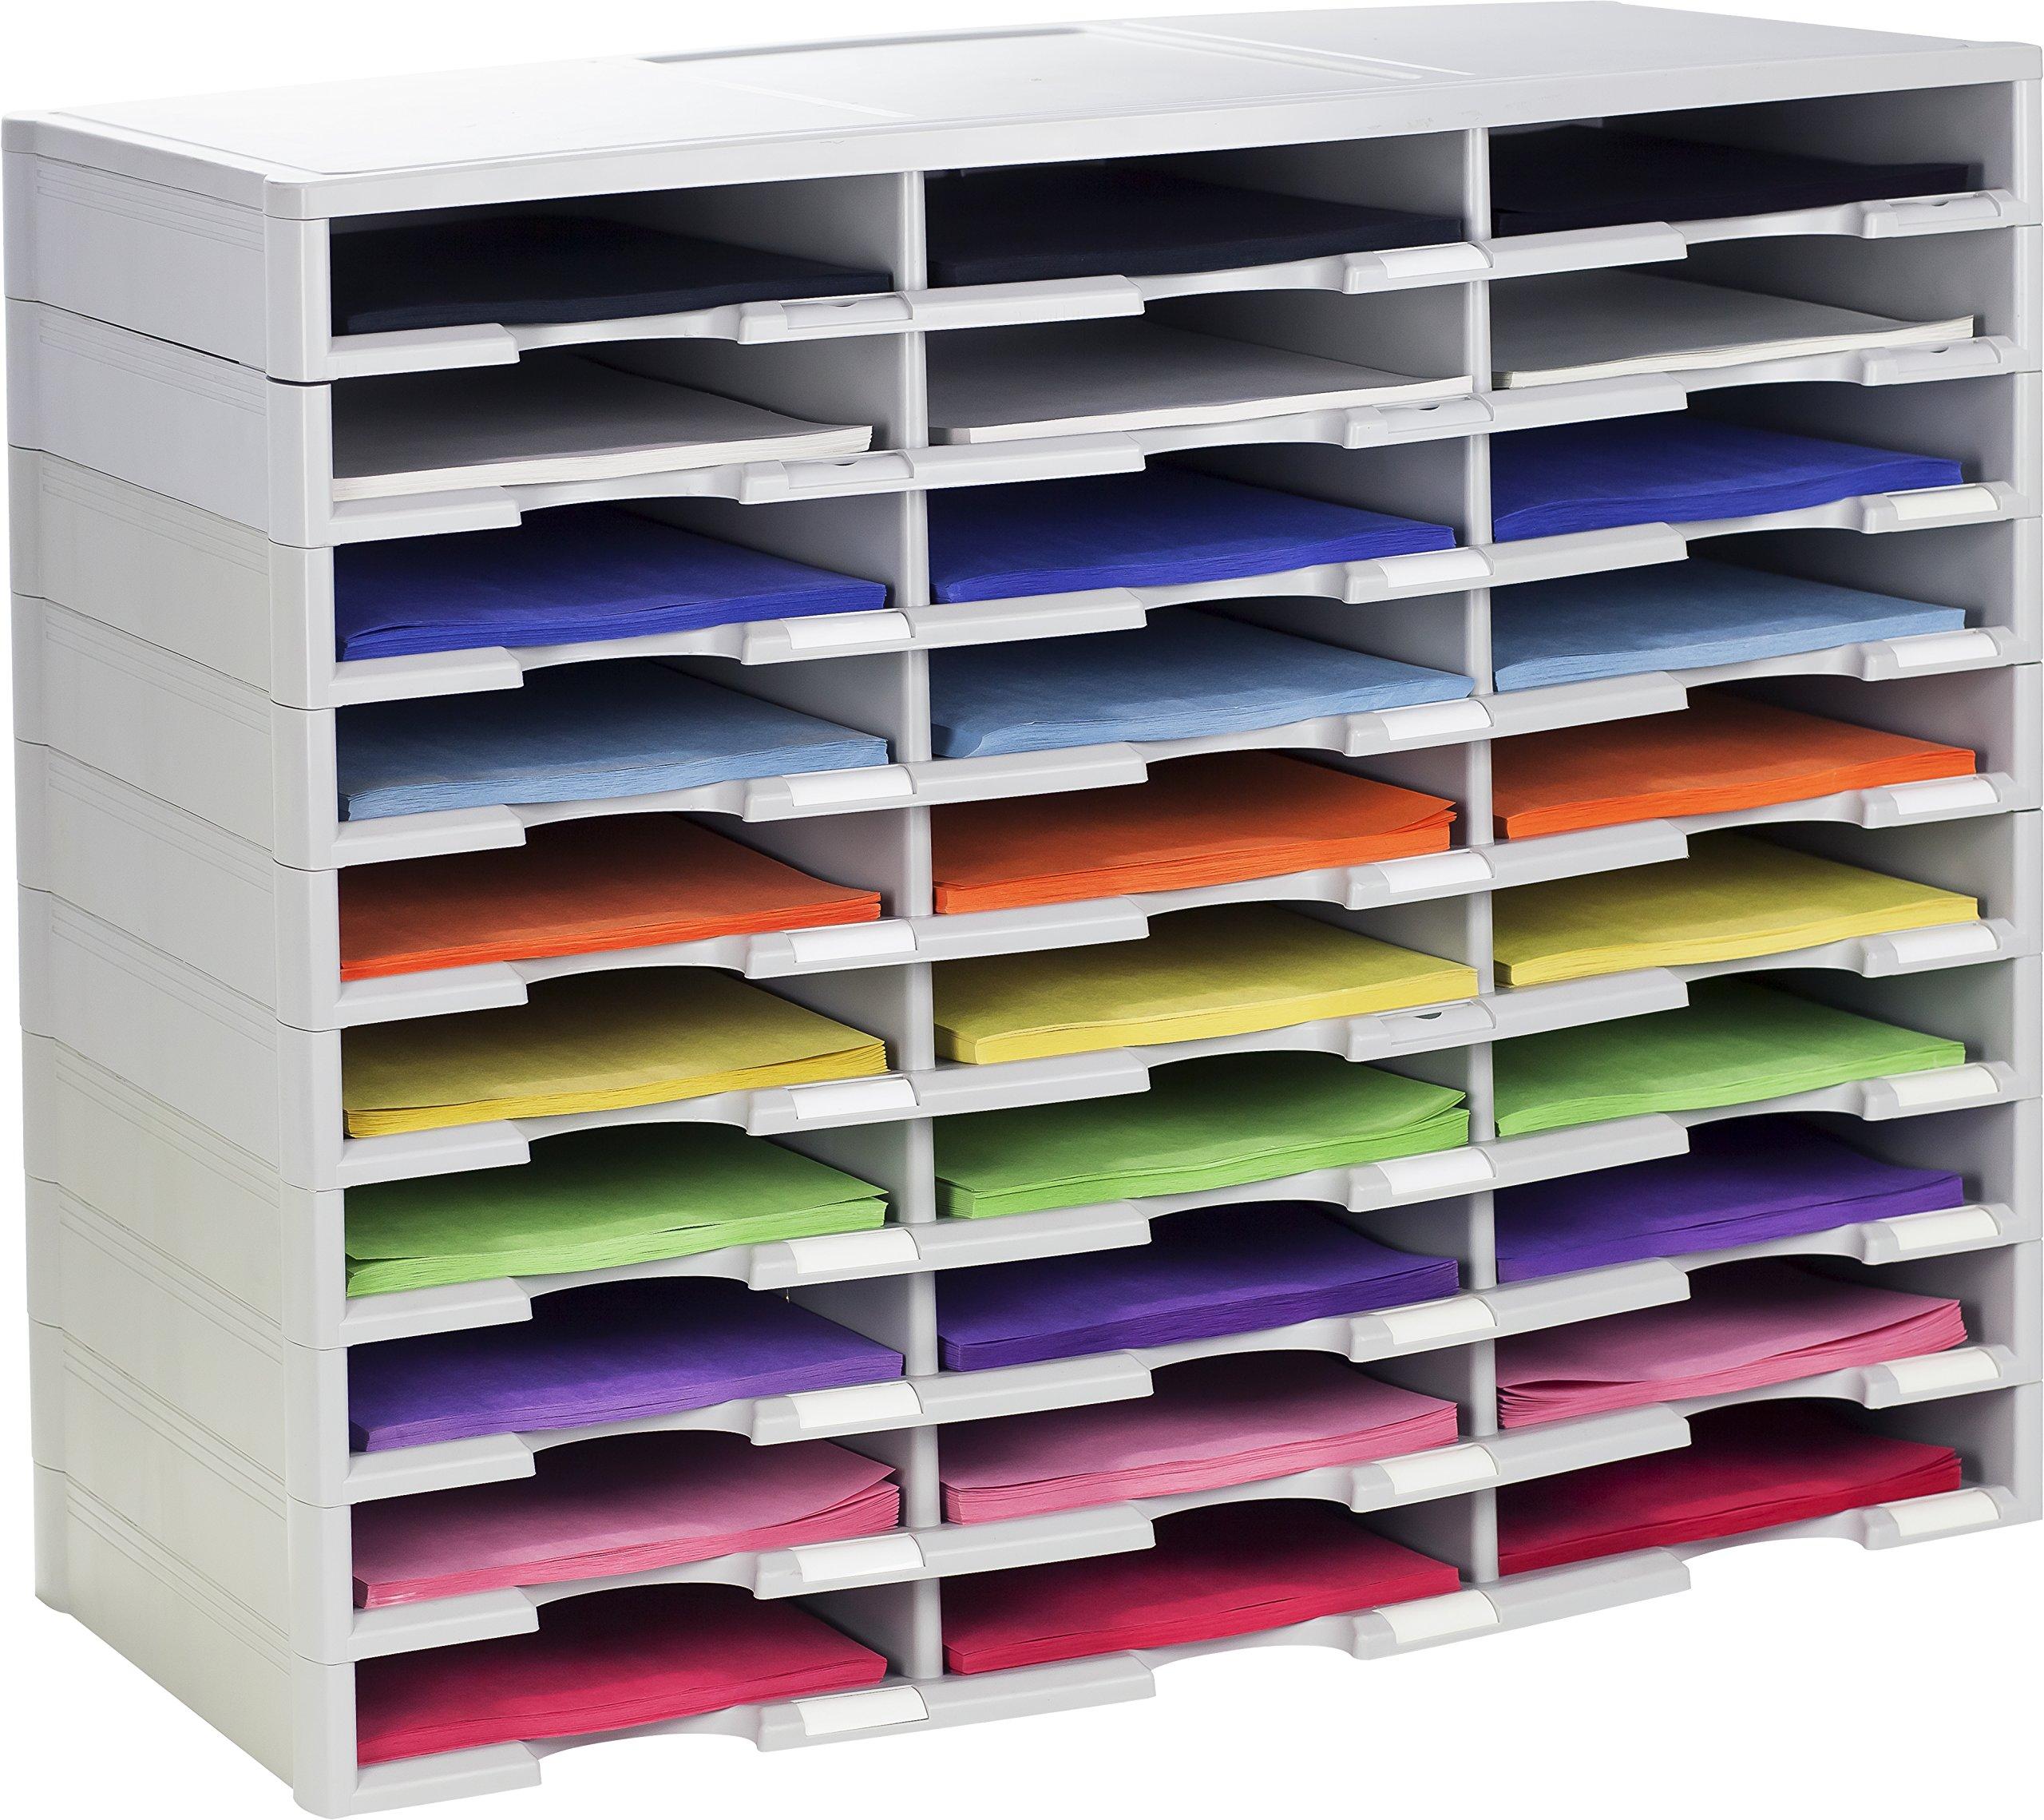 Storex 30-Compartment Literature Organizer, 31.38 x 14.13 x 25.5 Inches, Gray (61418U01C)